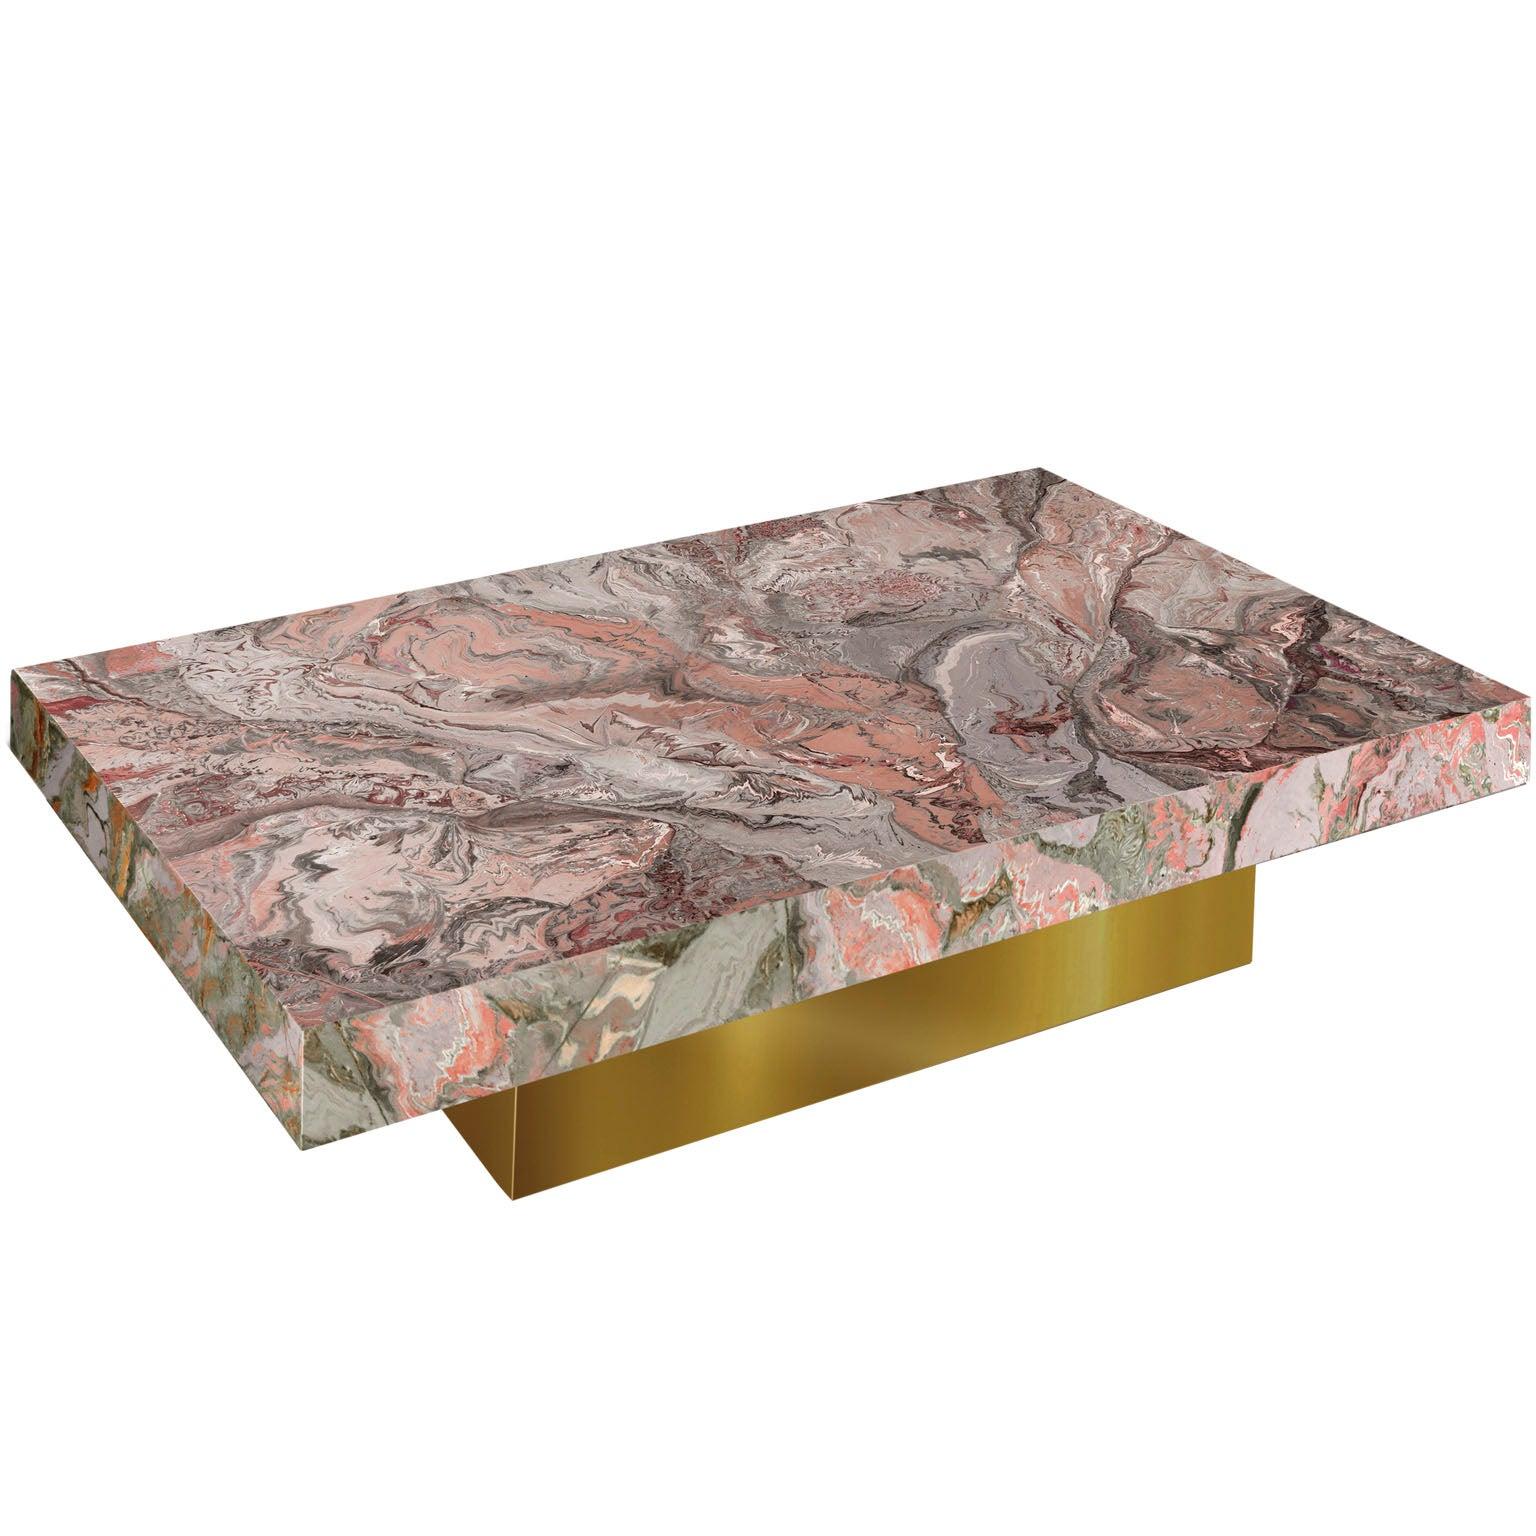 Modern Coffee Table  Pink Grey Marbled Scagliola Decoration Gold Leaf Base